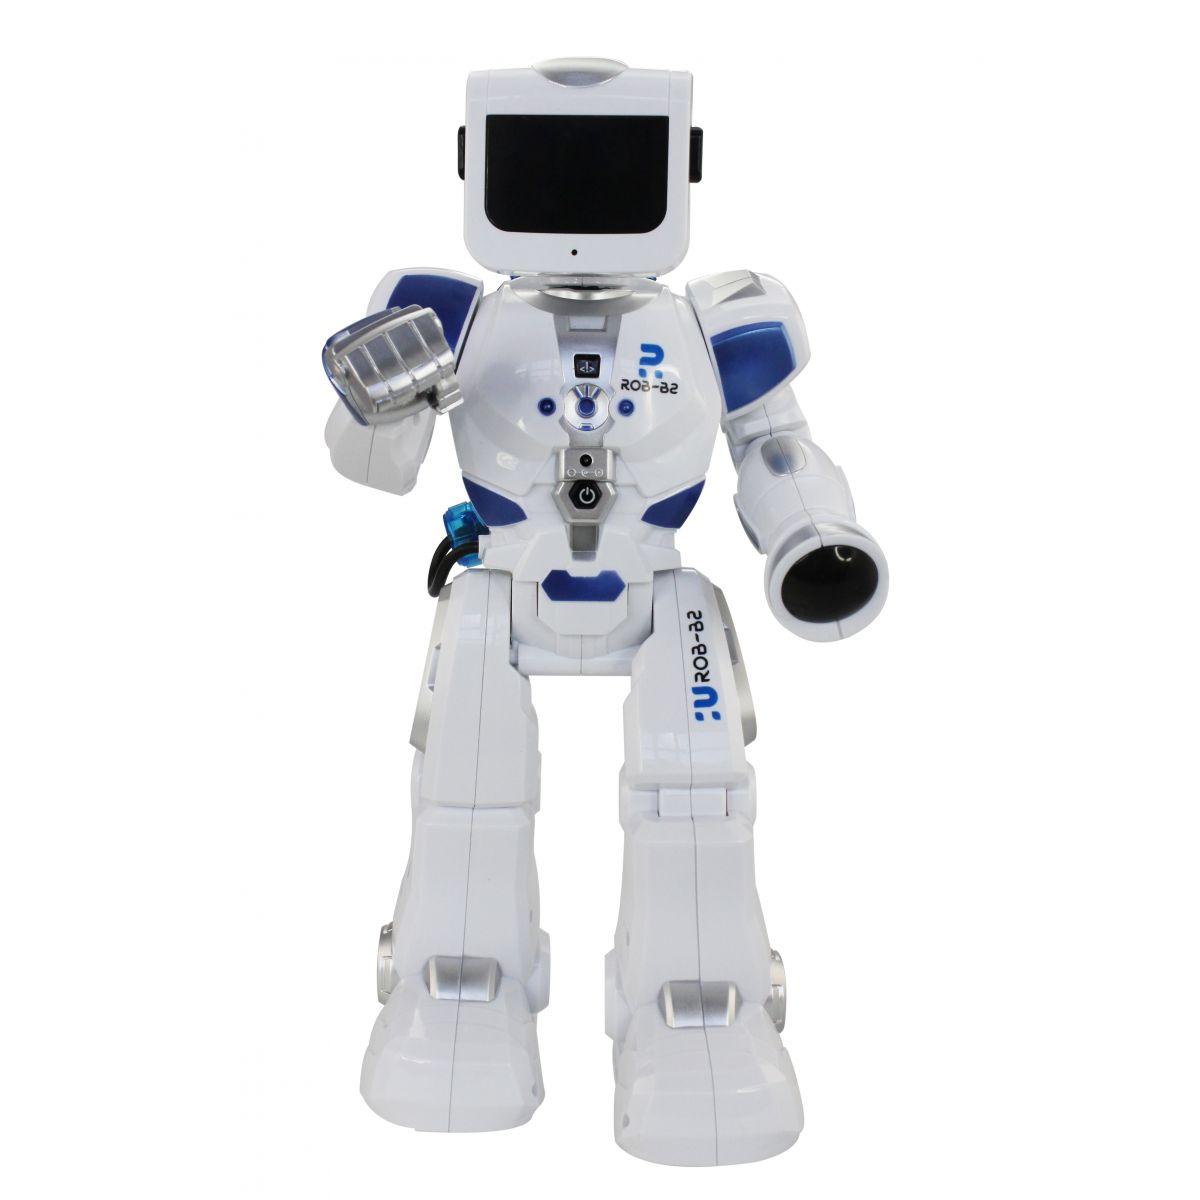 Epline RC Robot ROB-B2